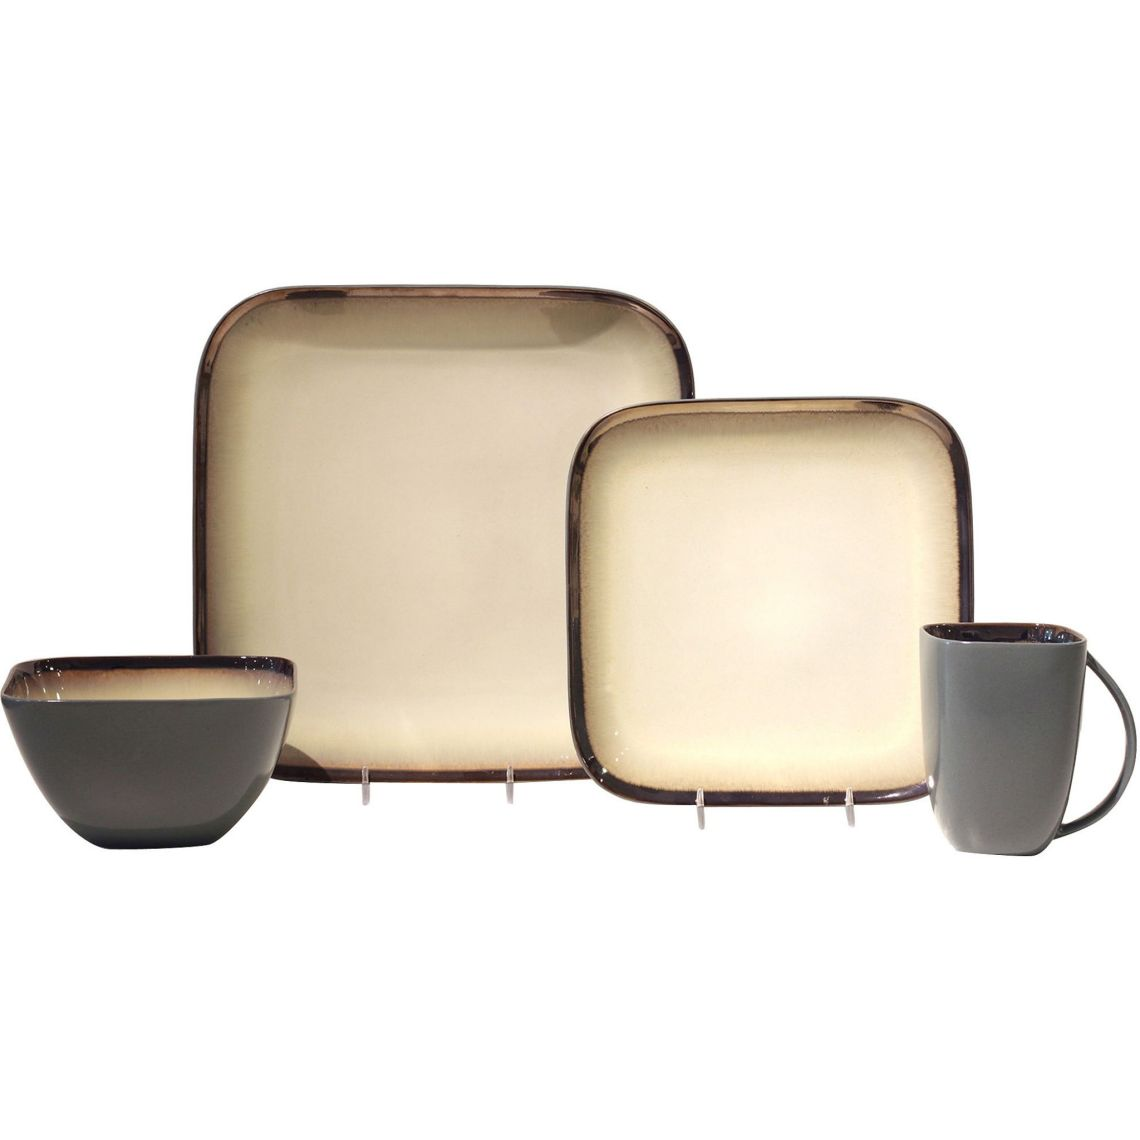 Baum Harrison Square 16-Piece Stoneware Dinnerware Set, Ivory - Walmart.com